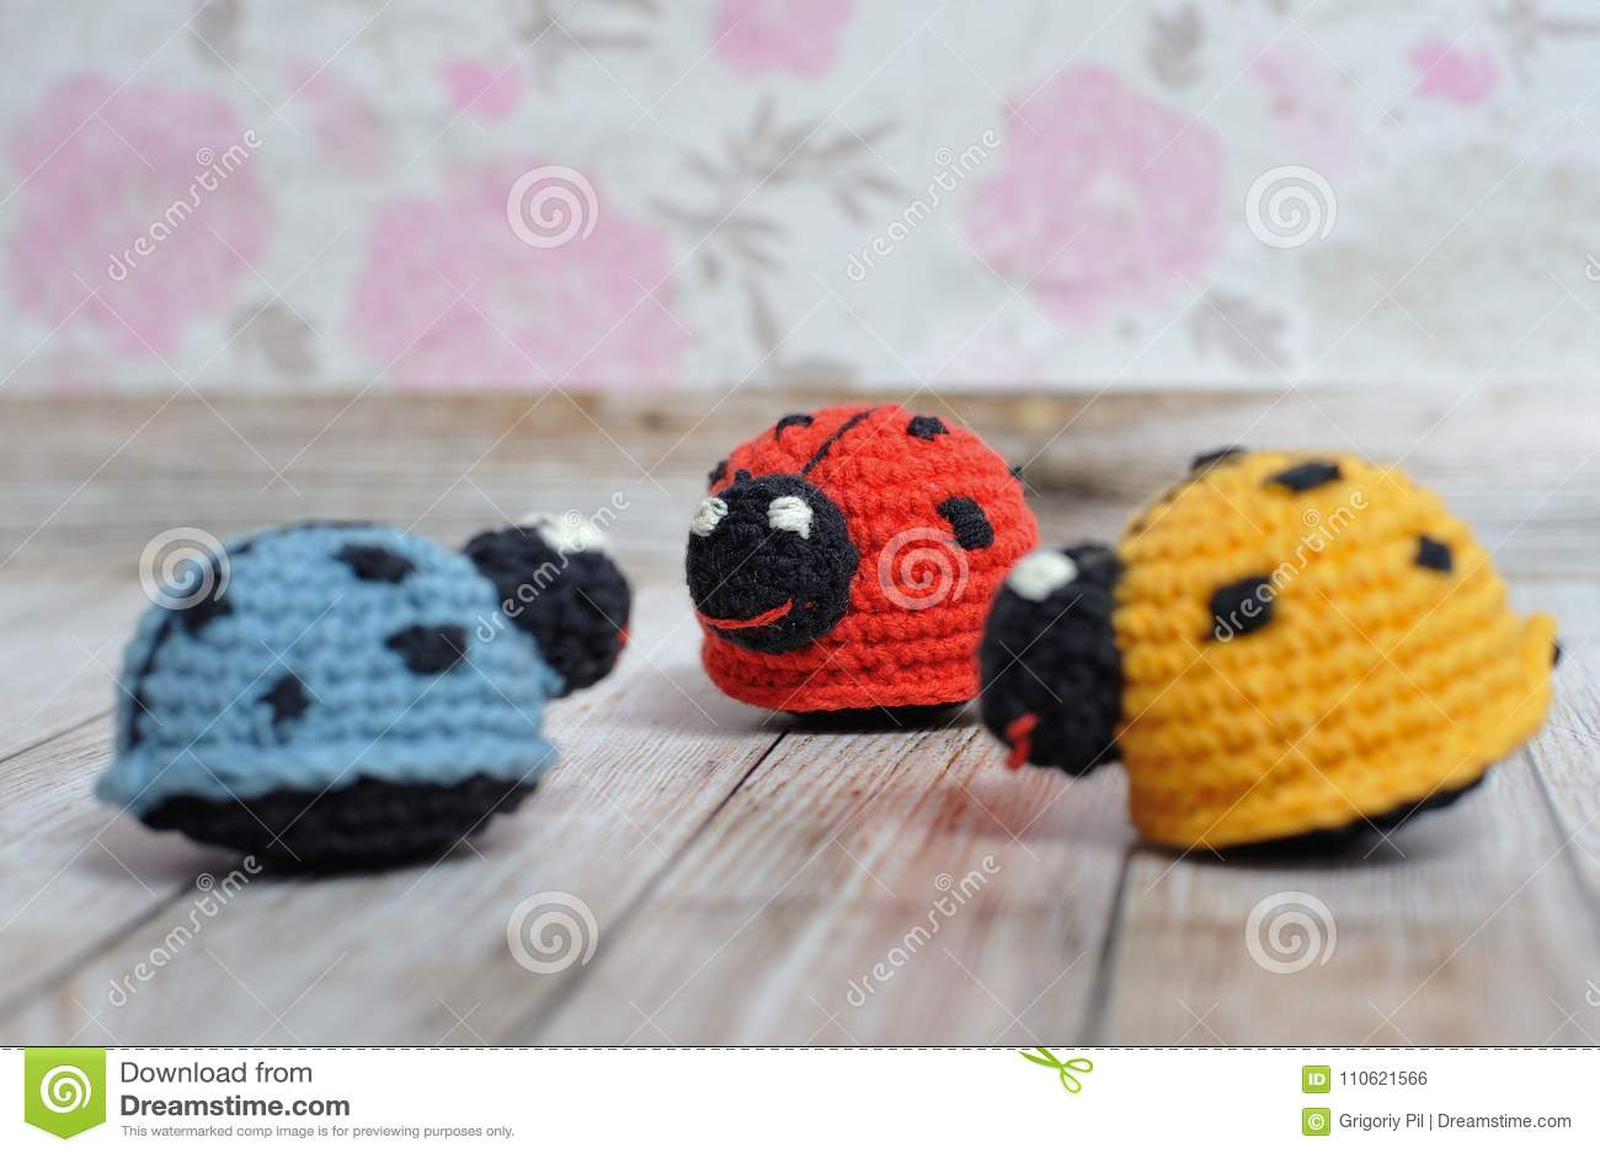 crochet toys amigurumi cute flower elephant|Baby Rattles & Mobiles ... | 955x1300